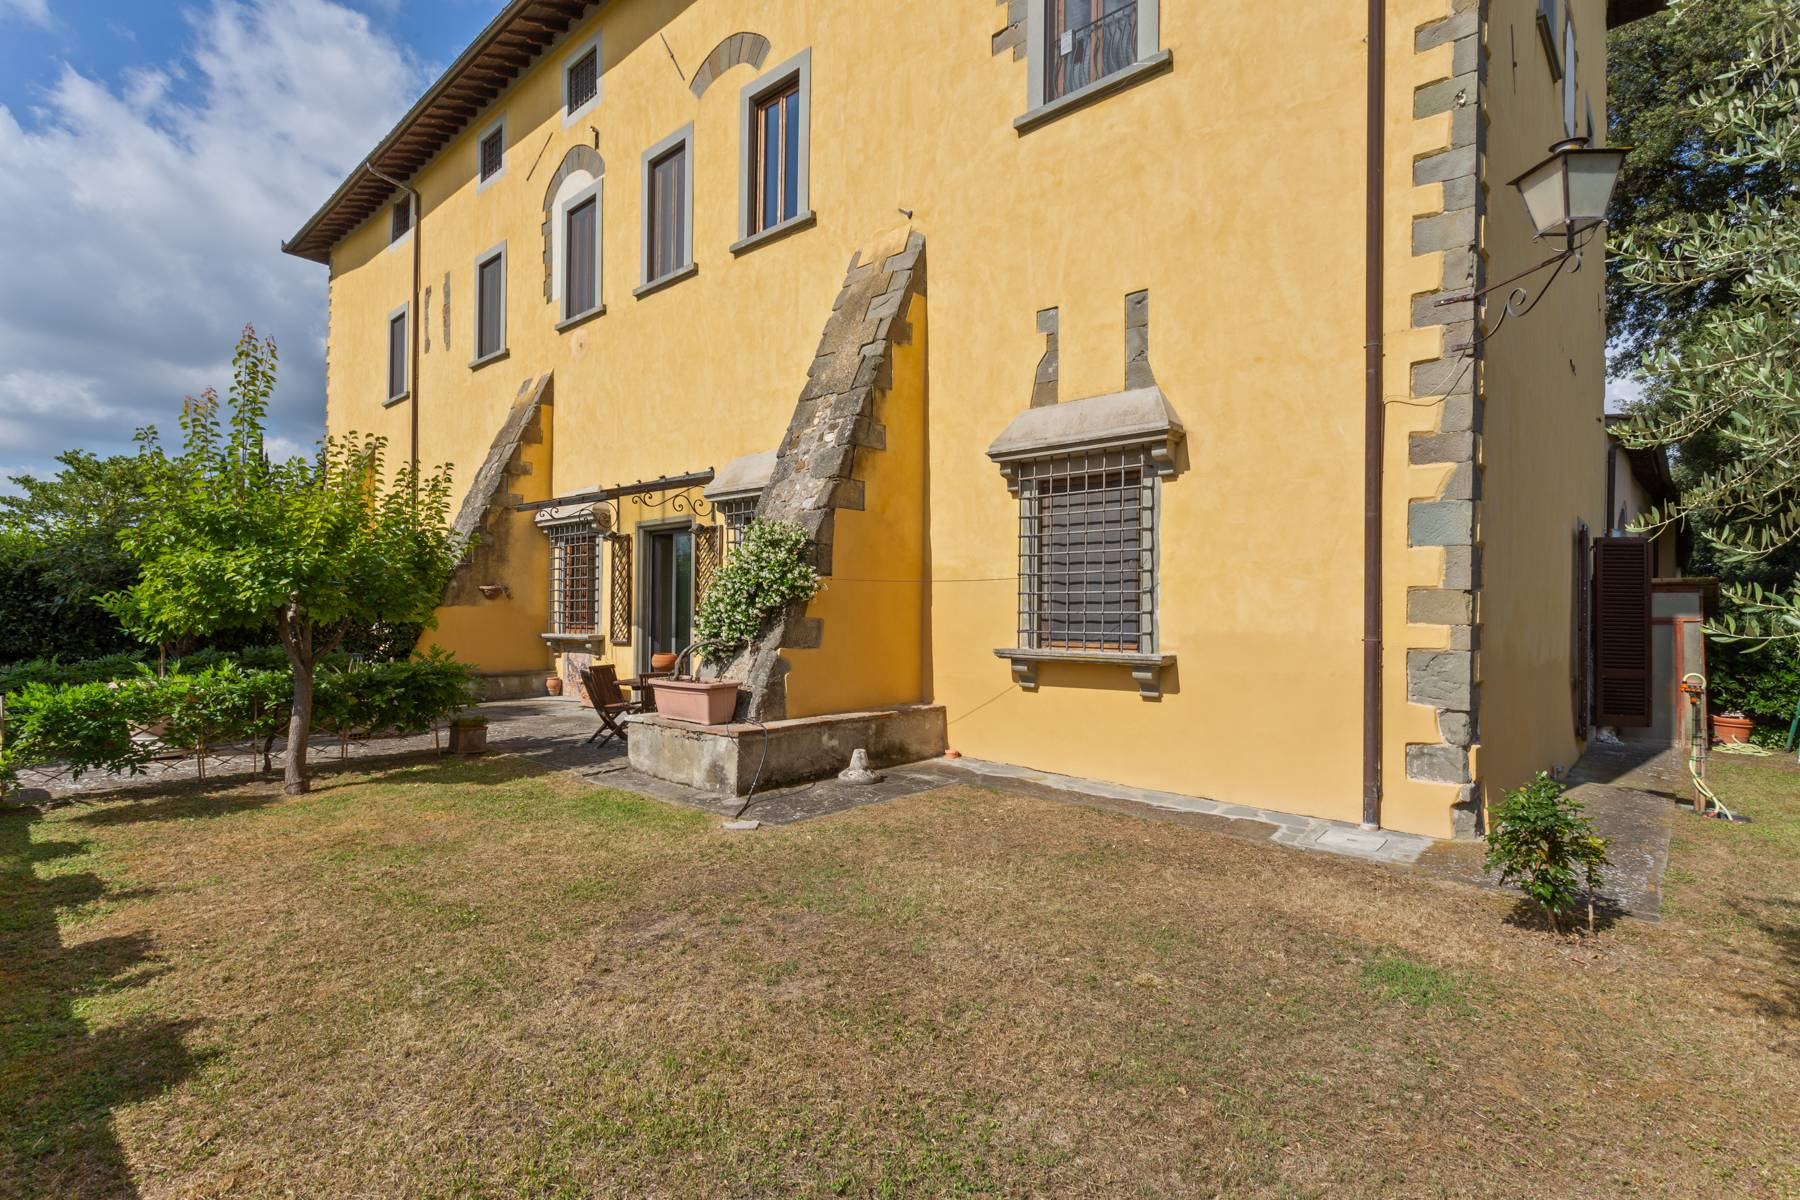 Appartamento in Vendita a Scandicci: 5 locali, 170 mq - Foto 3